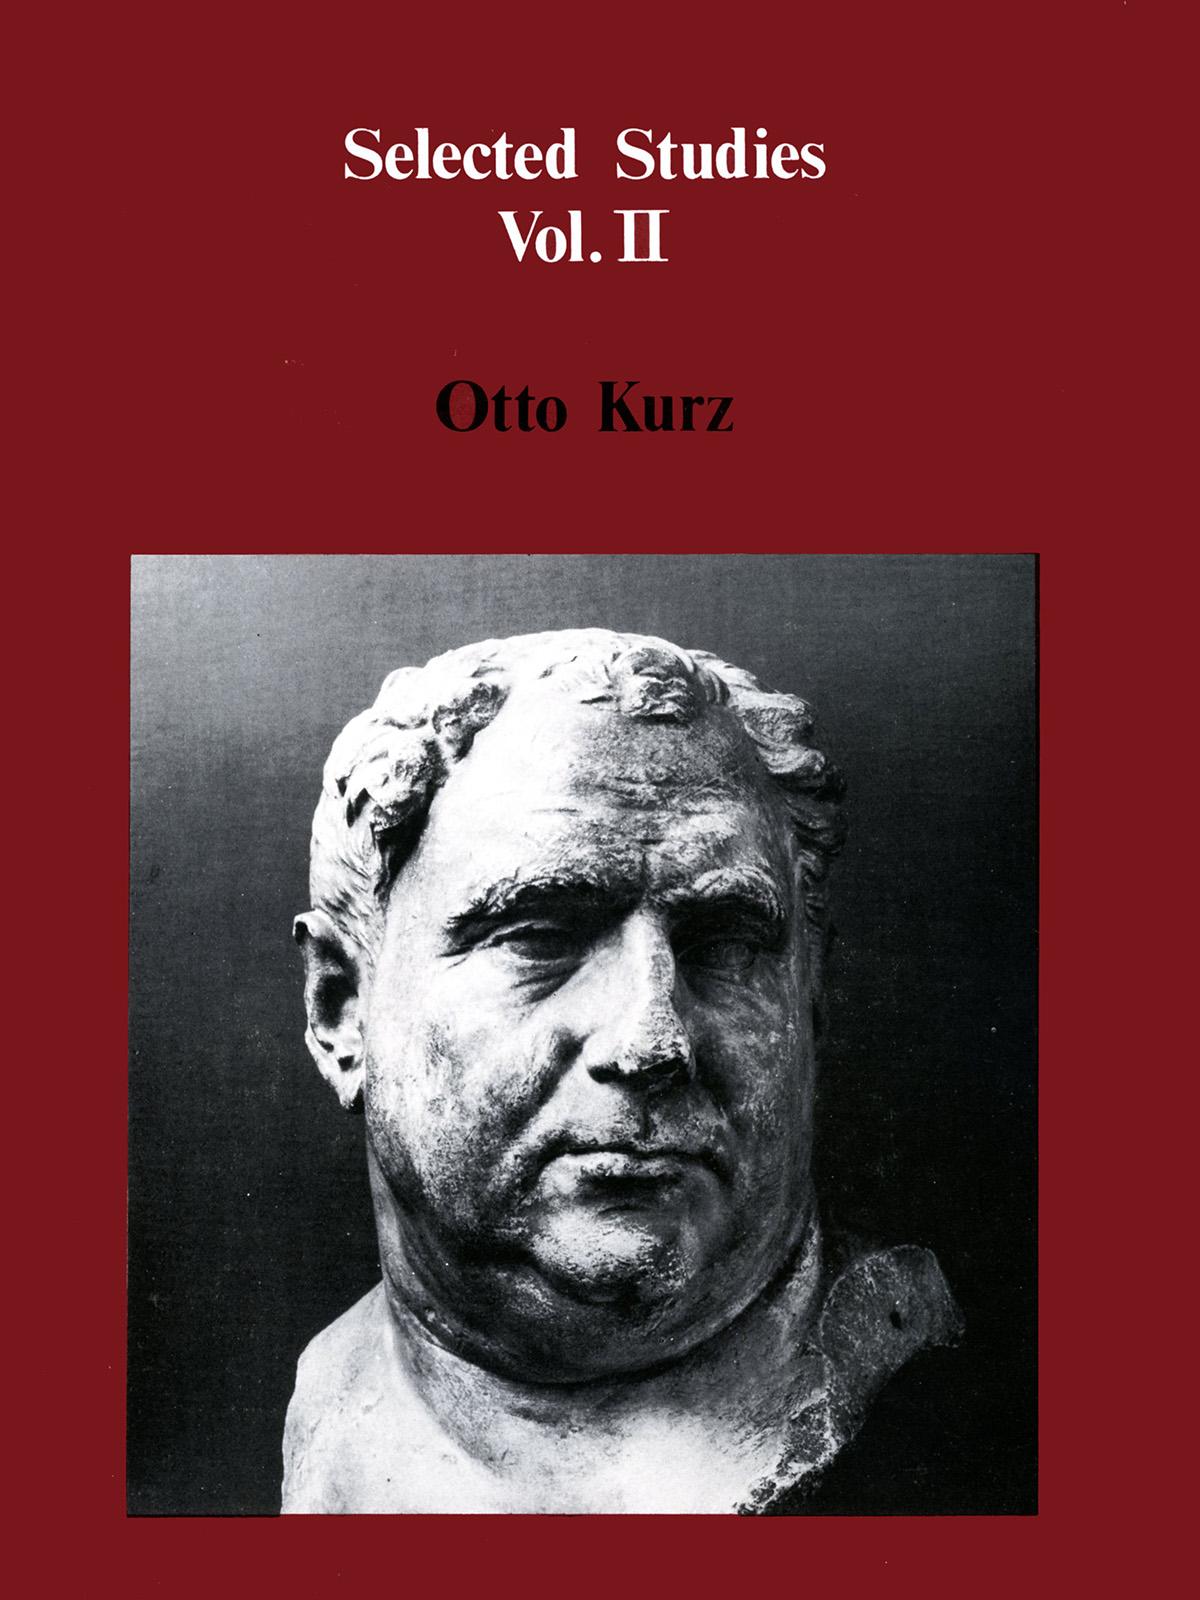 Otto Kurz